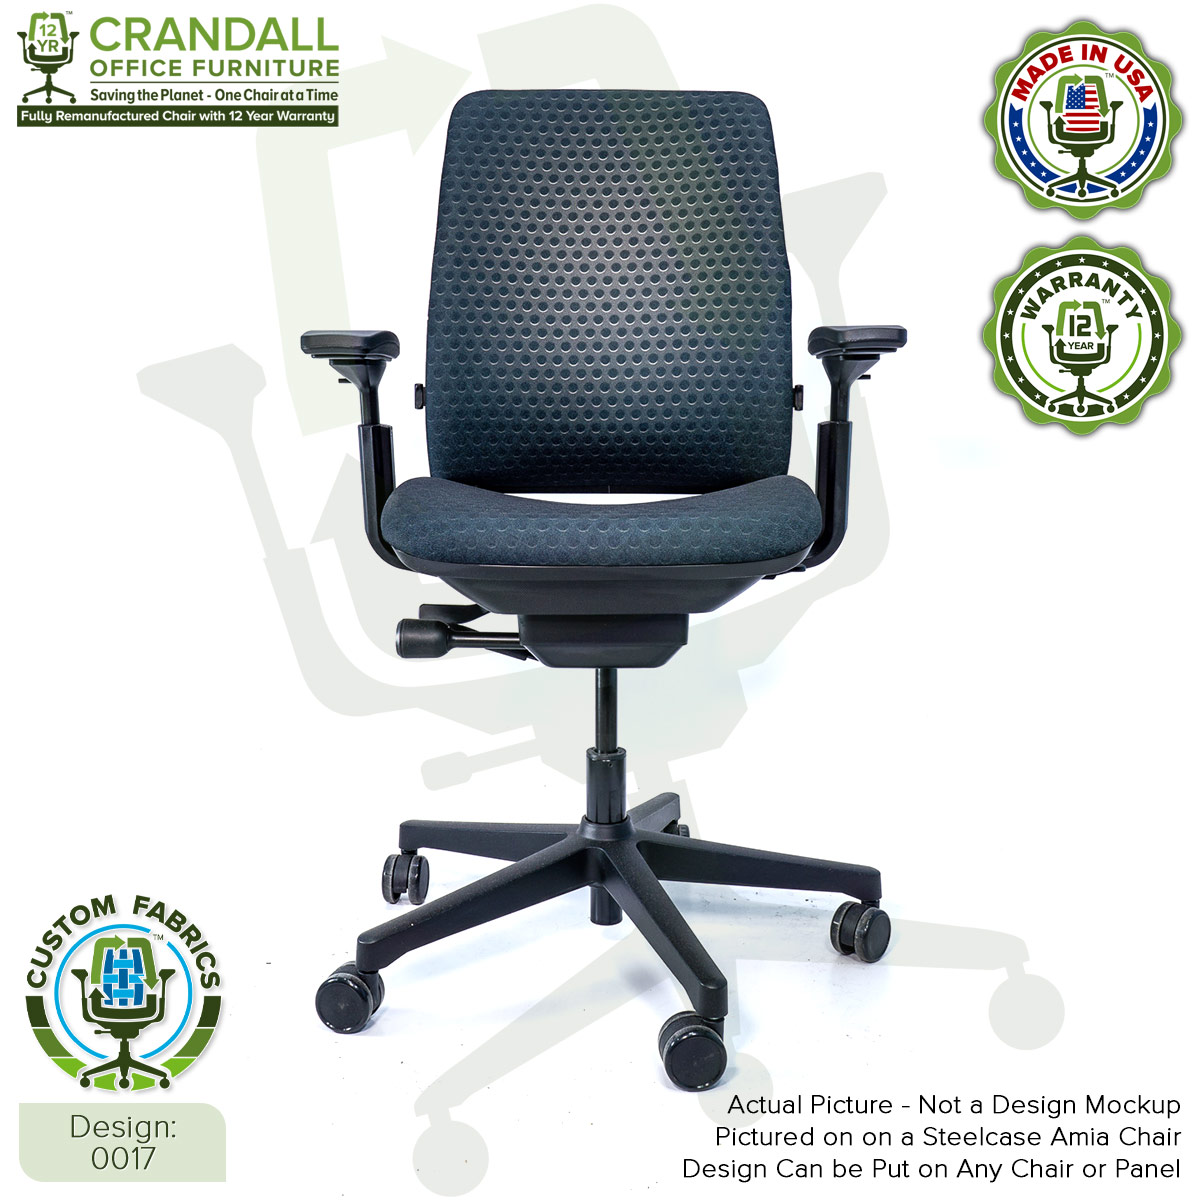 Custom Fabric Remanufactured Steelcase Amia Chair - Design 0017